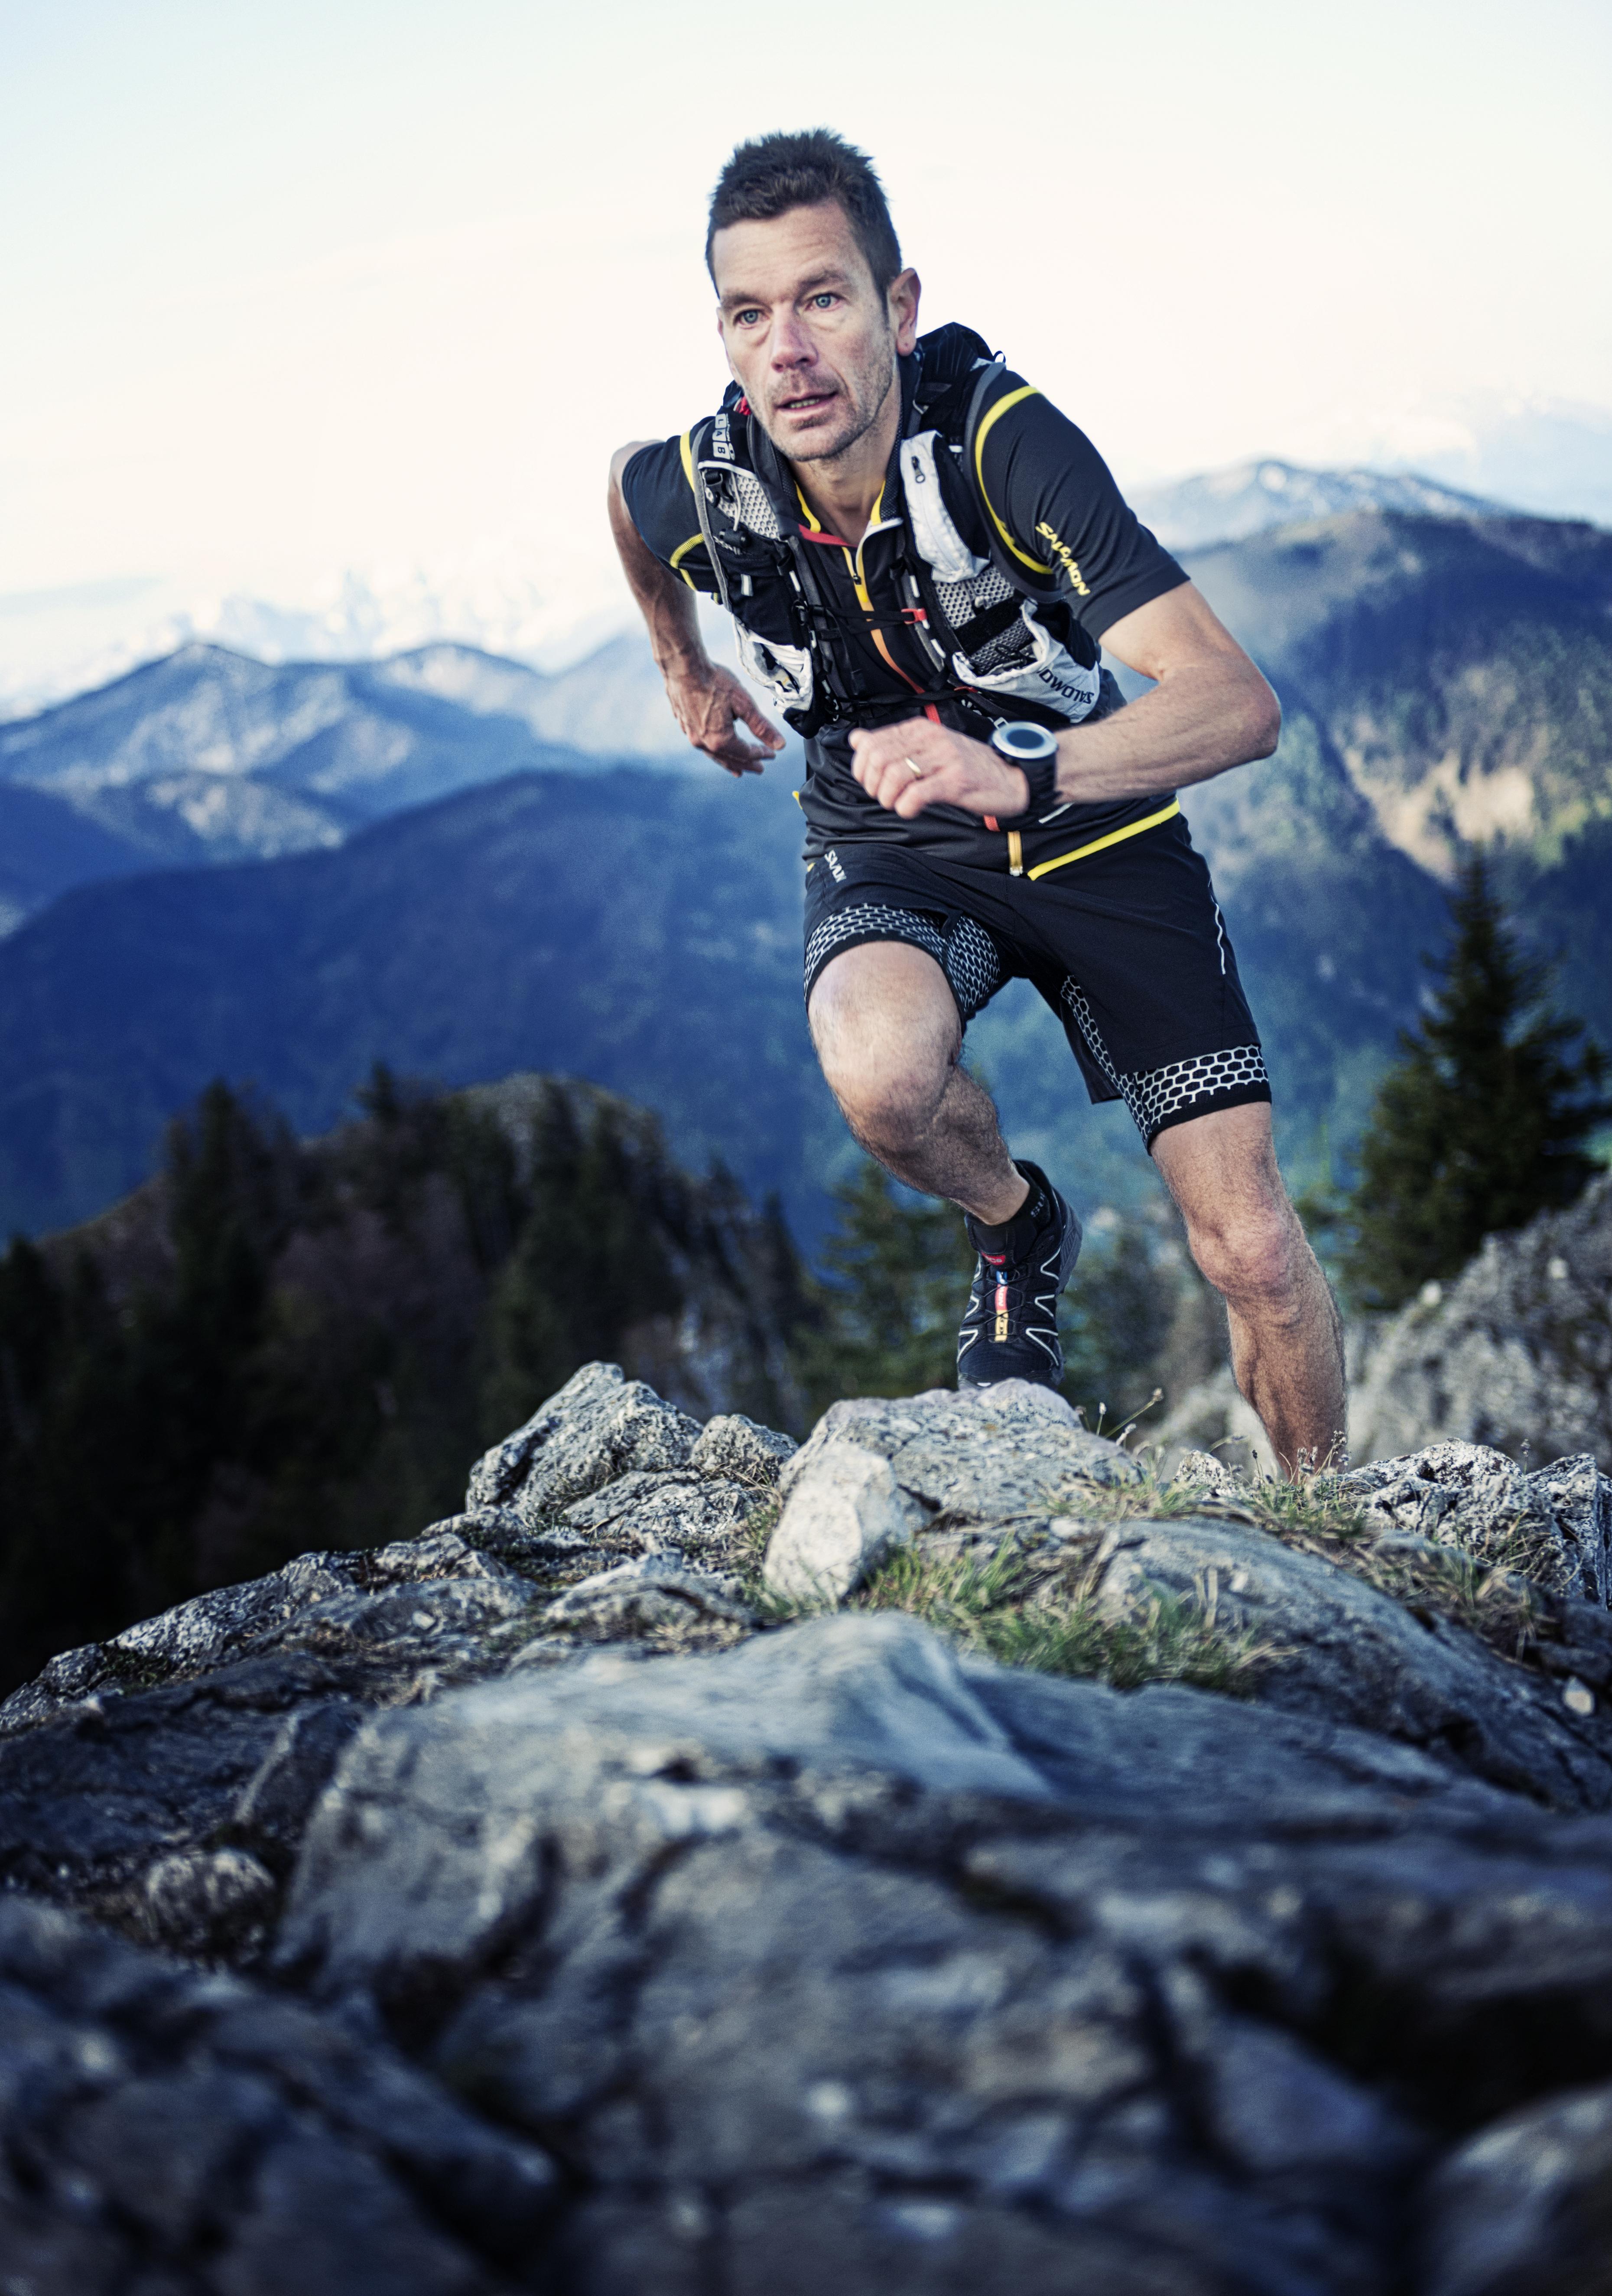 Jonathan Wyatt in Fuschl am See, Austria